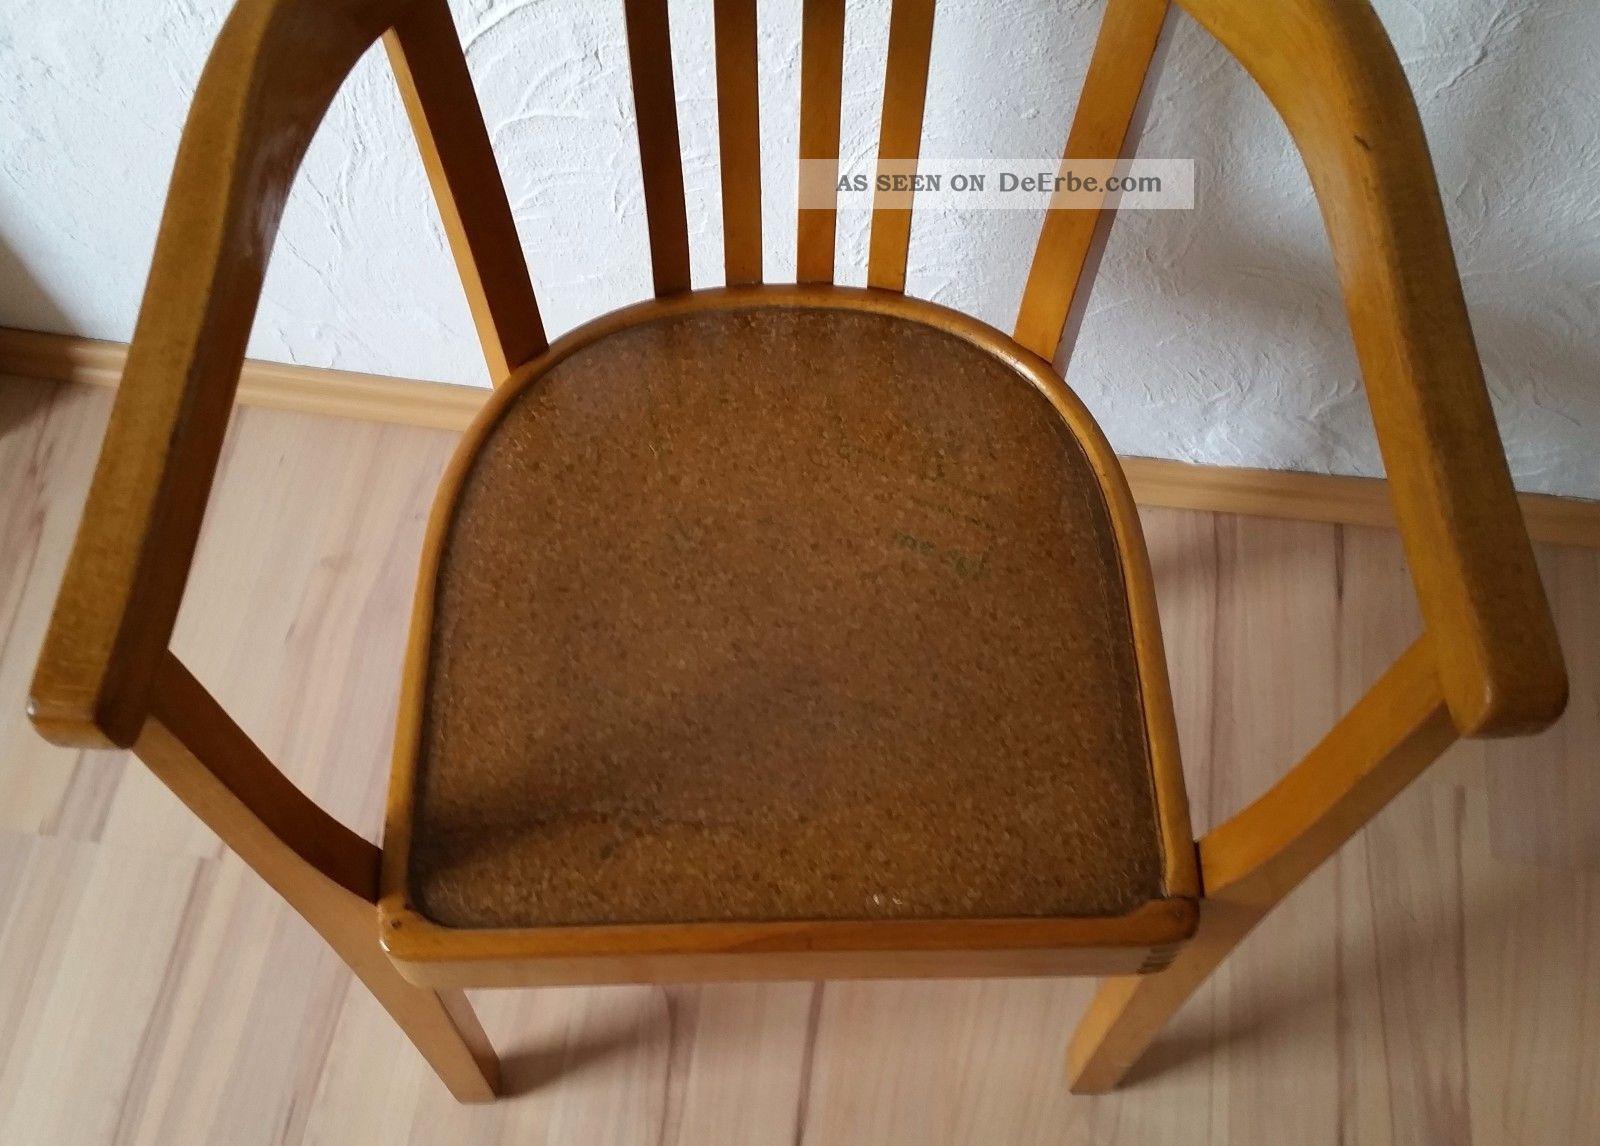 armlehnstuhl holzstuhl bauhaus art deco cropius stil. Black Bedroom Furniture Sets. Home Design Ideas